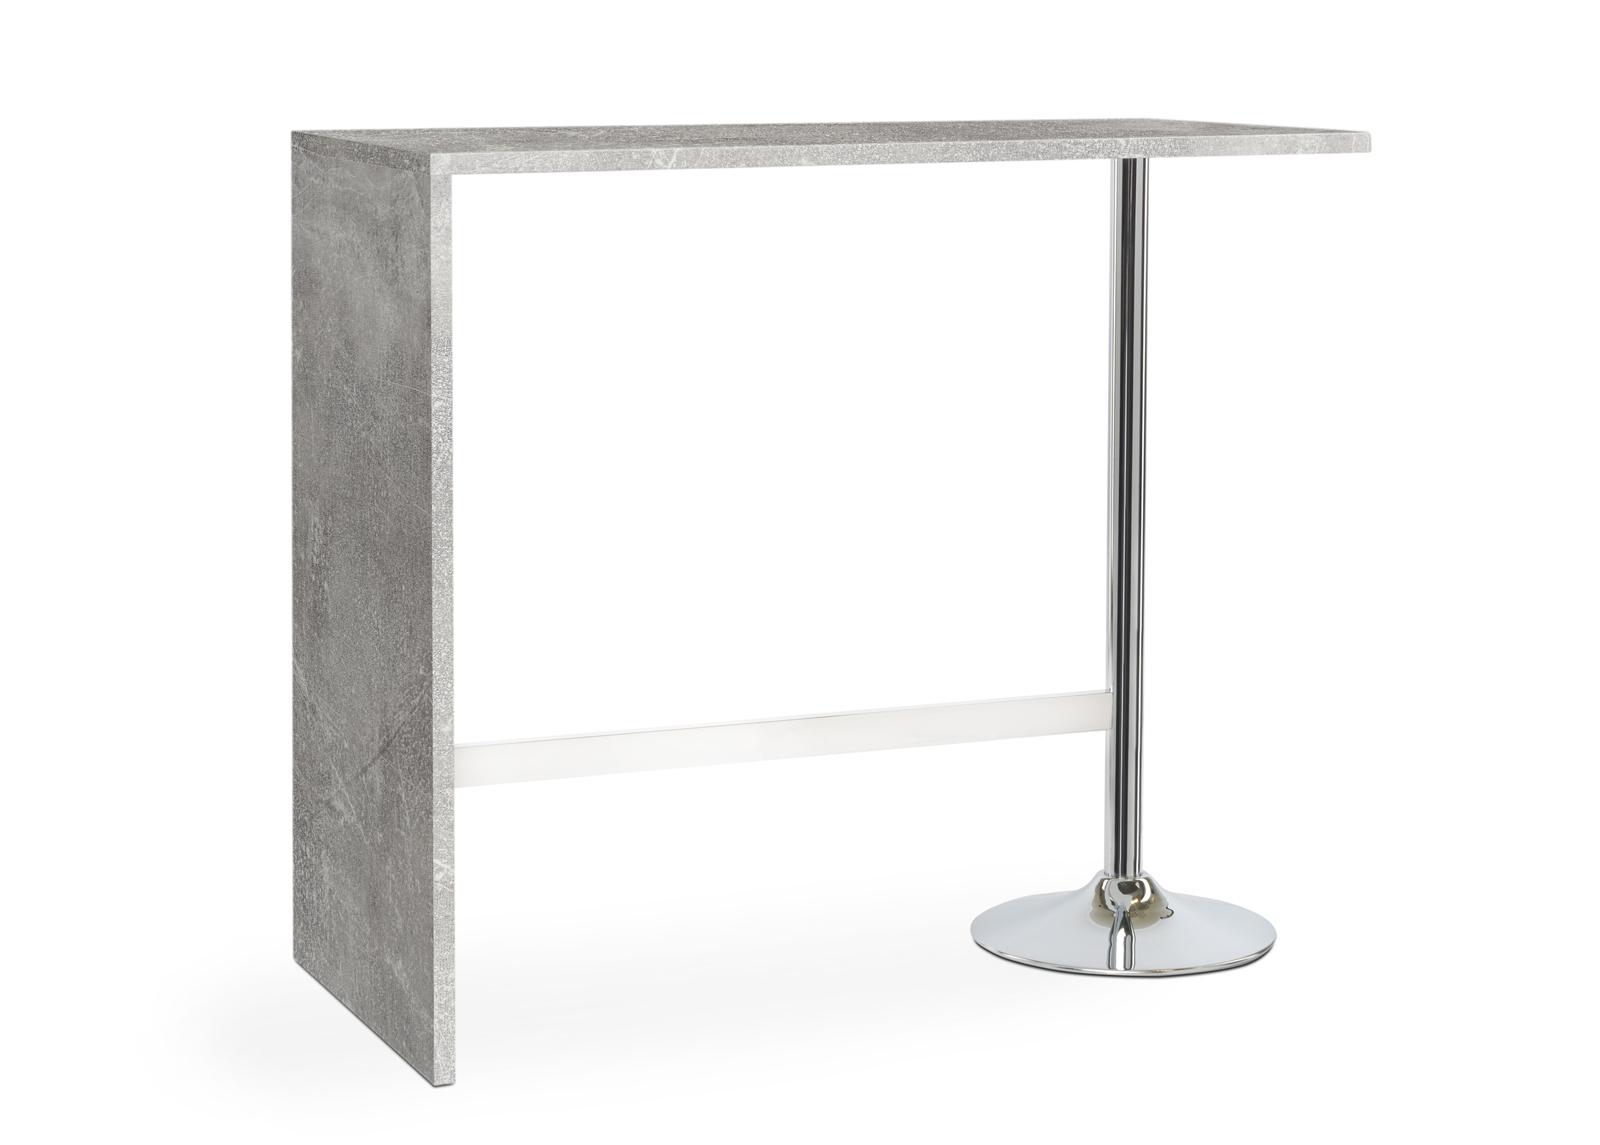 Baaripöytä 120x60 cm